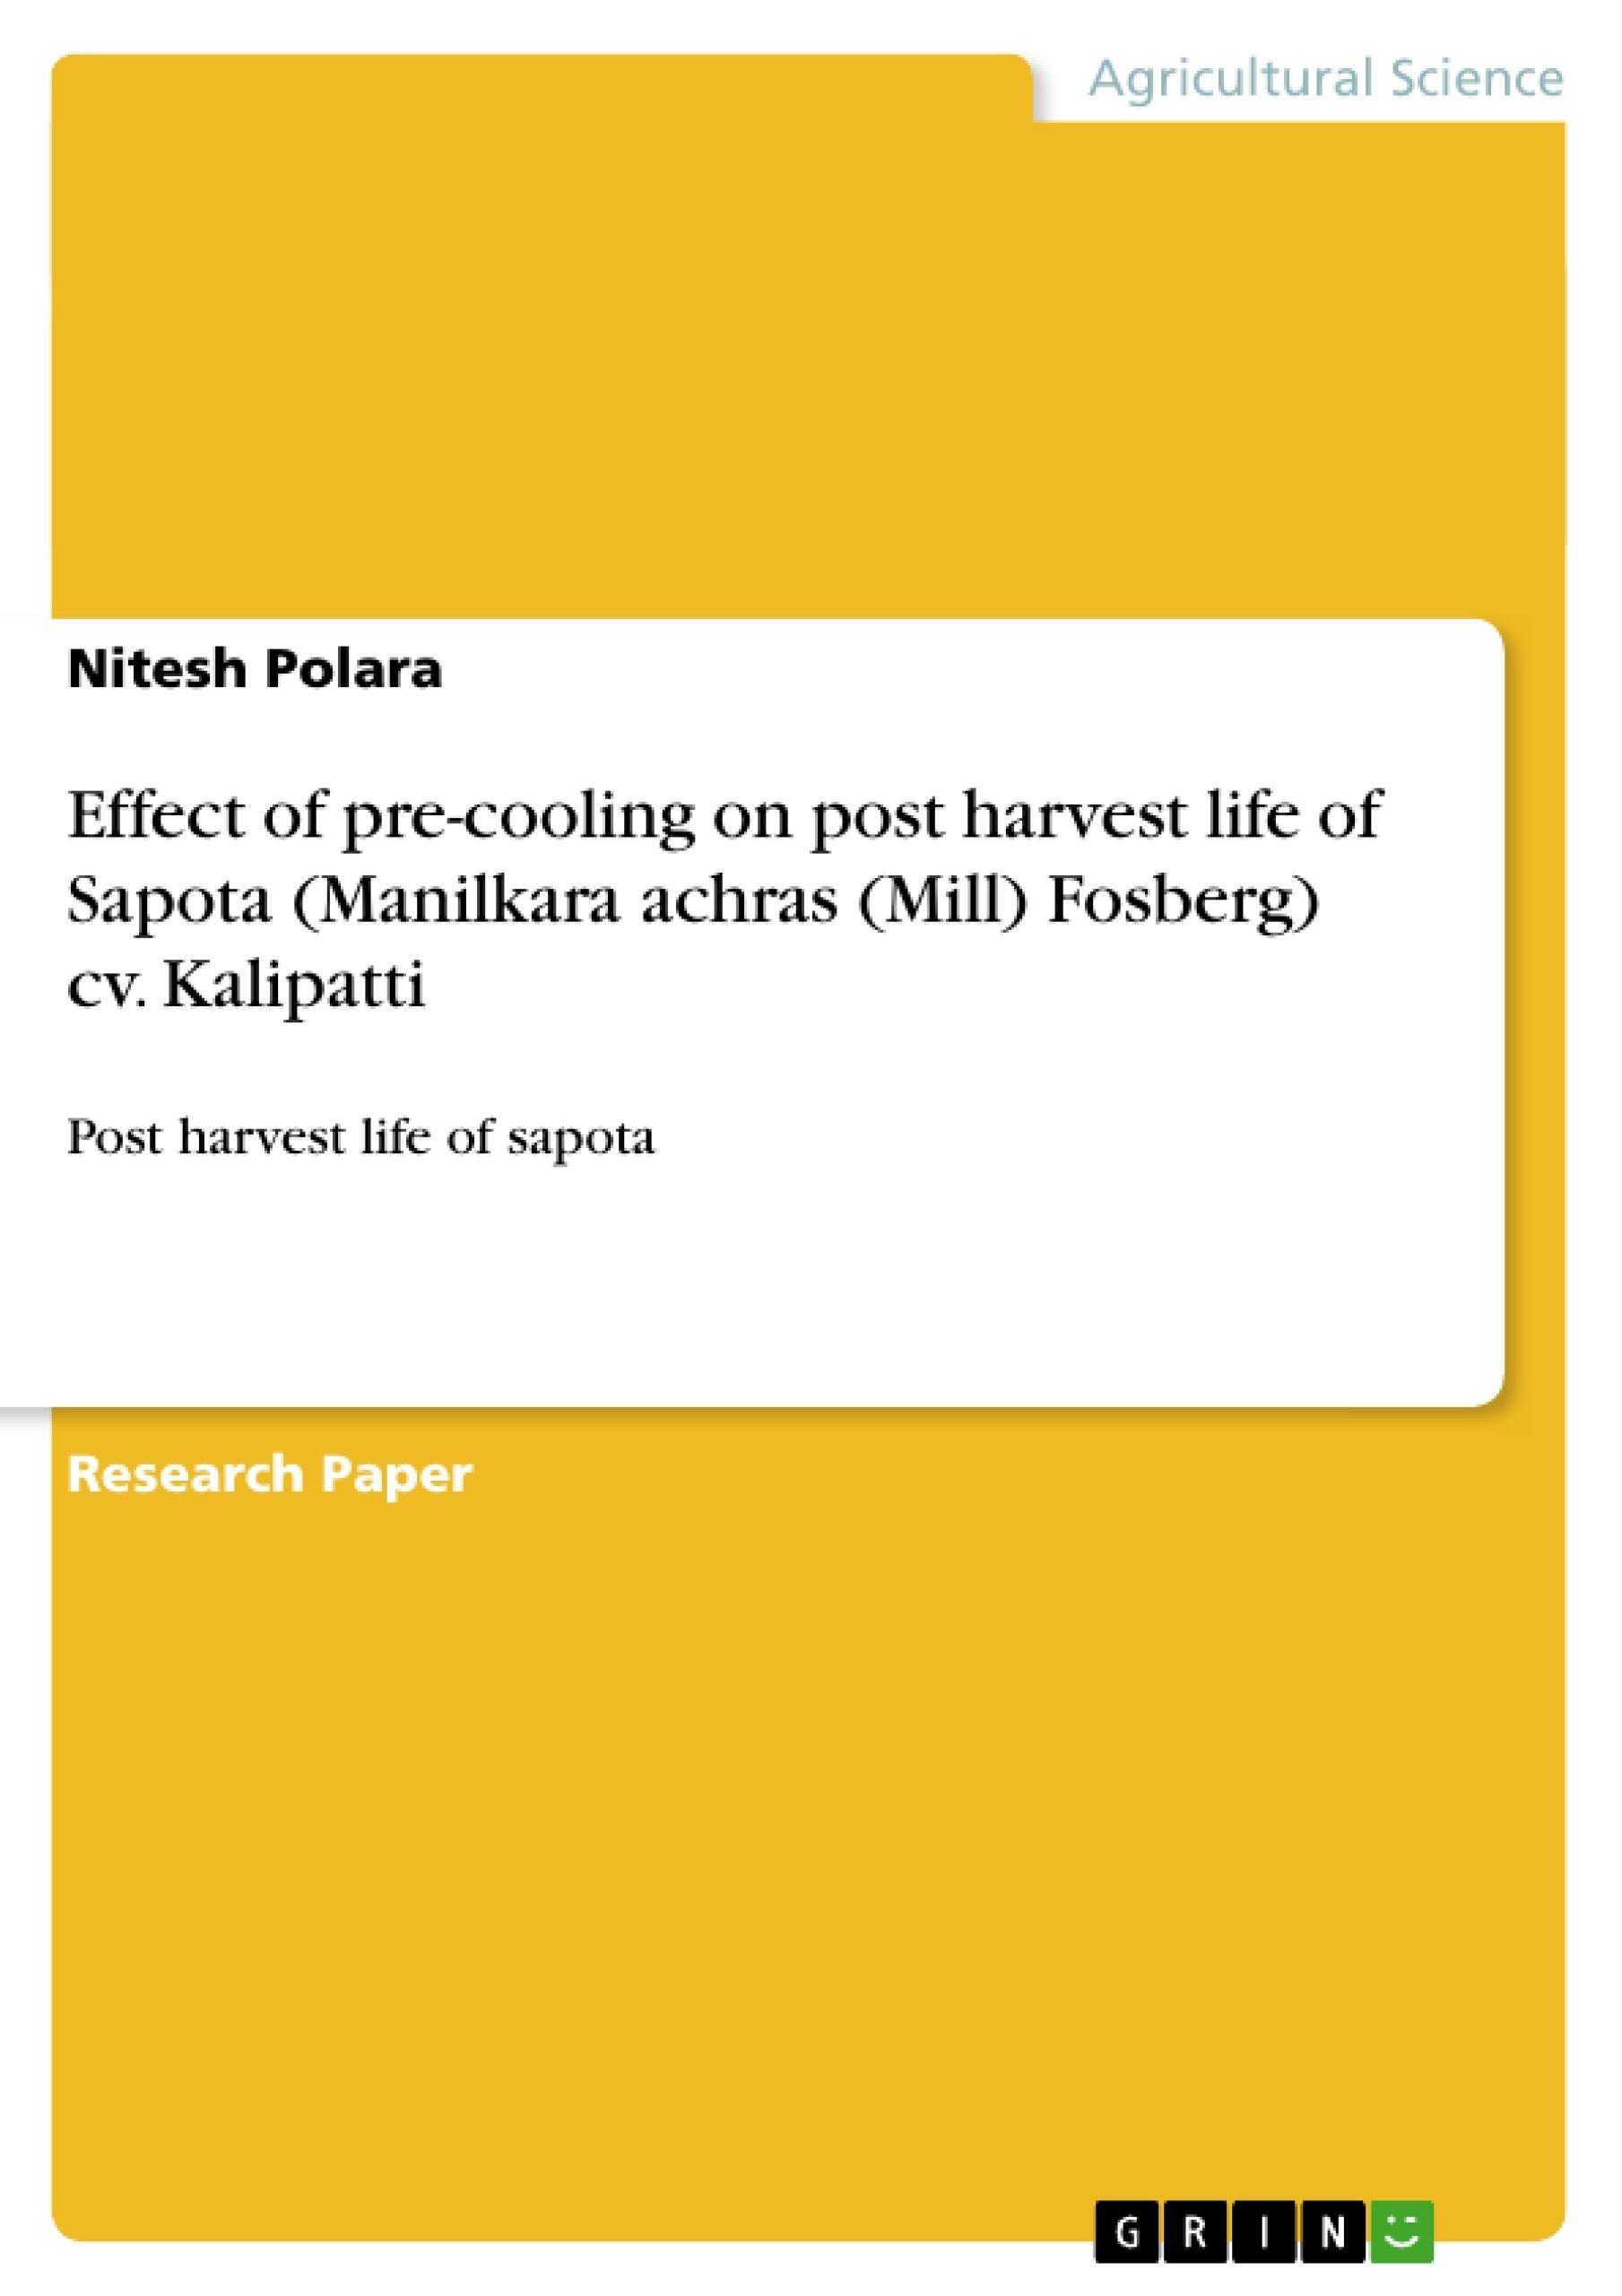 Title: Effect of pre-cooling on post harvest life of Sapota (Manilkara achras (Mill) Fosberg) cv. Kalipatti